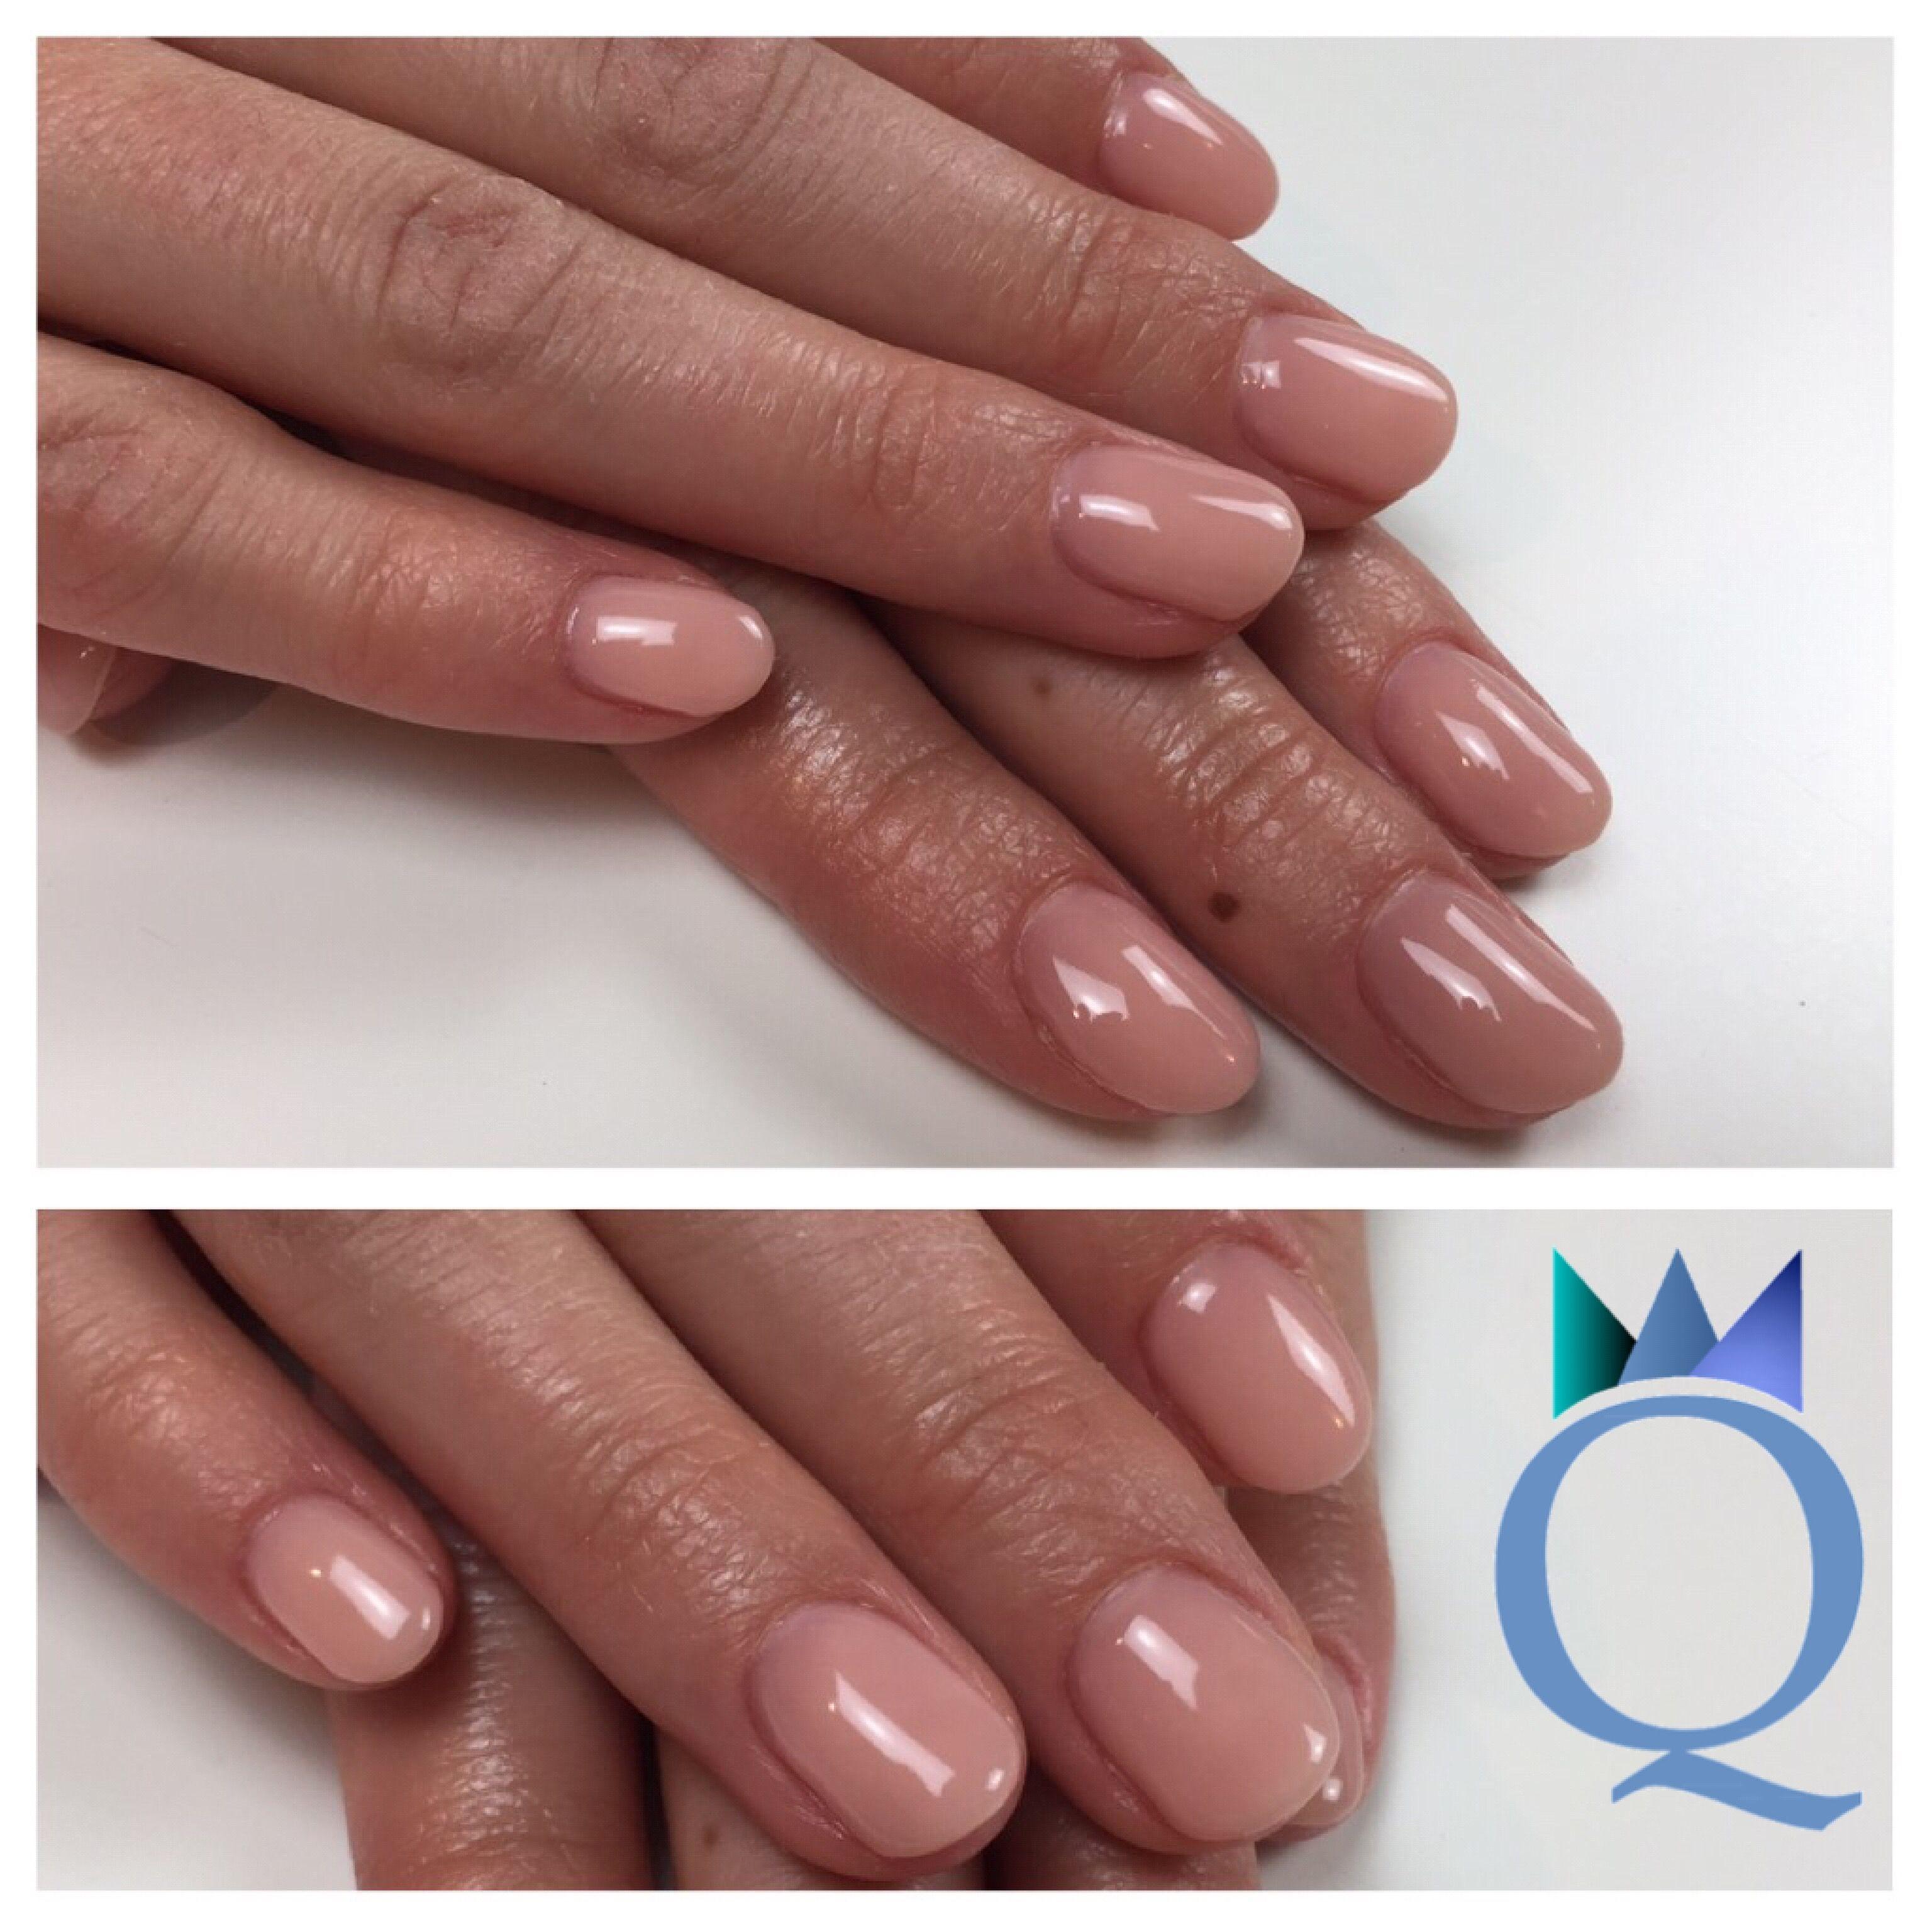 shortnails #gelnails #nails #naturalnails #nude #kurzenägel ...